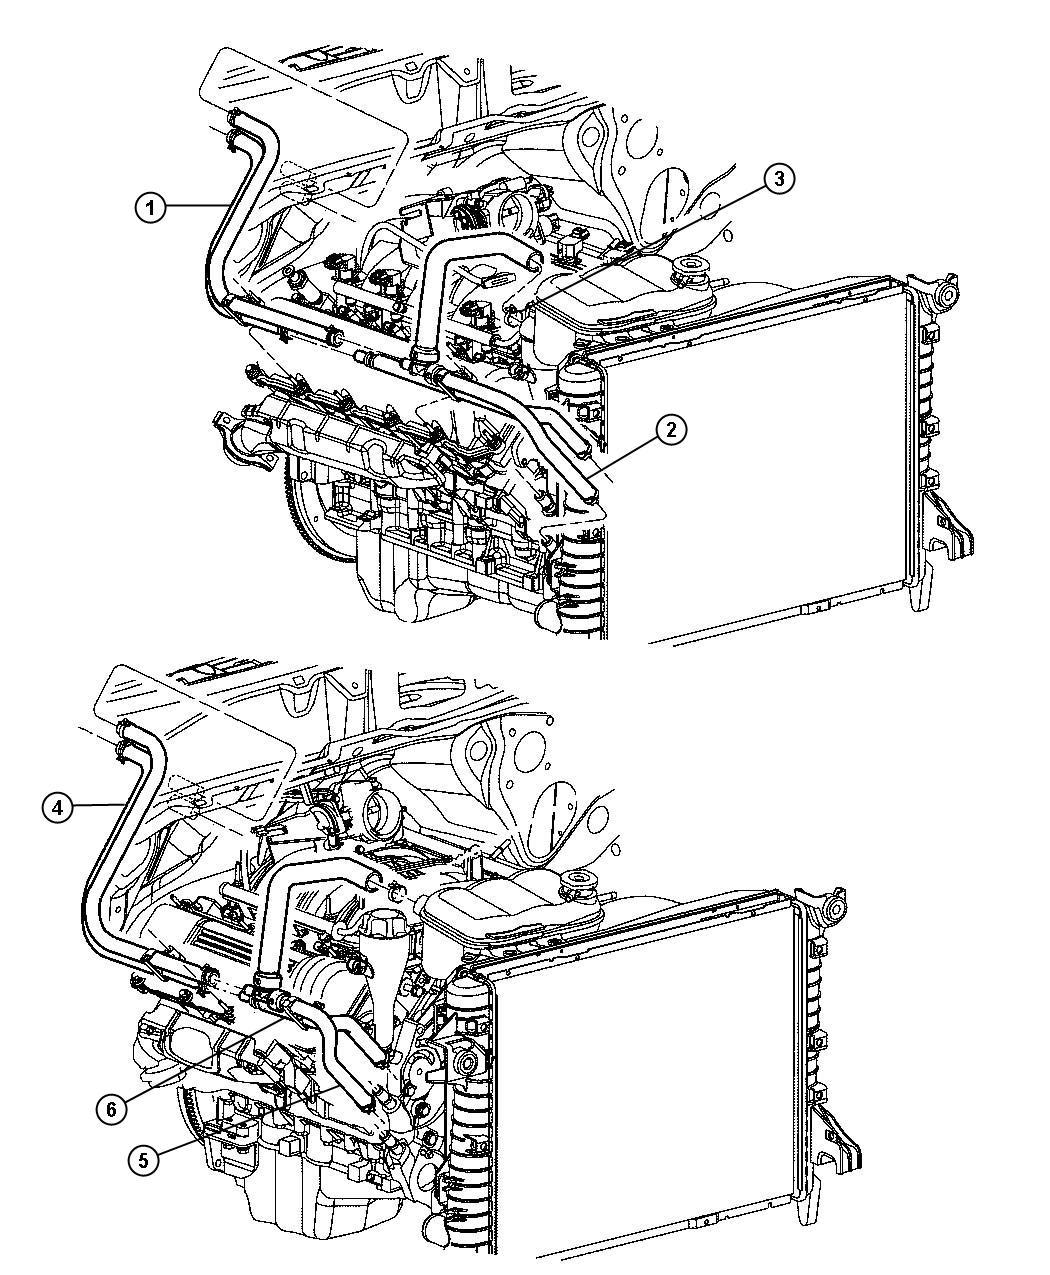 2001 dodge ram 1500 spark plug diagram 2001 free engine image for